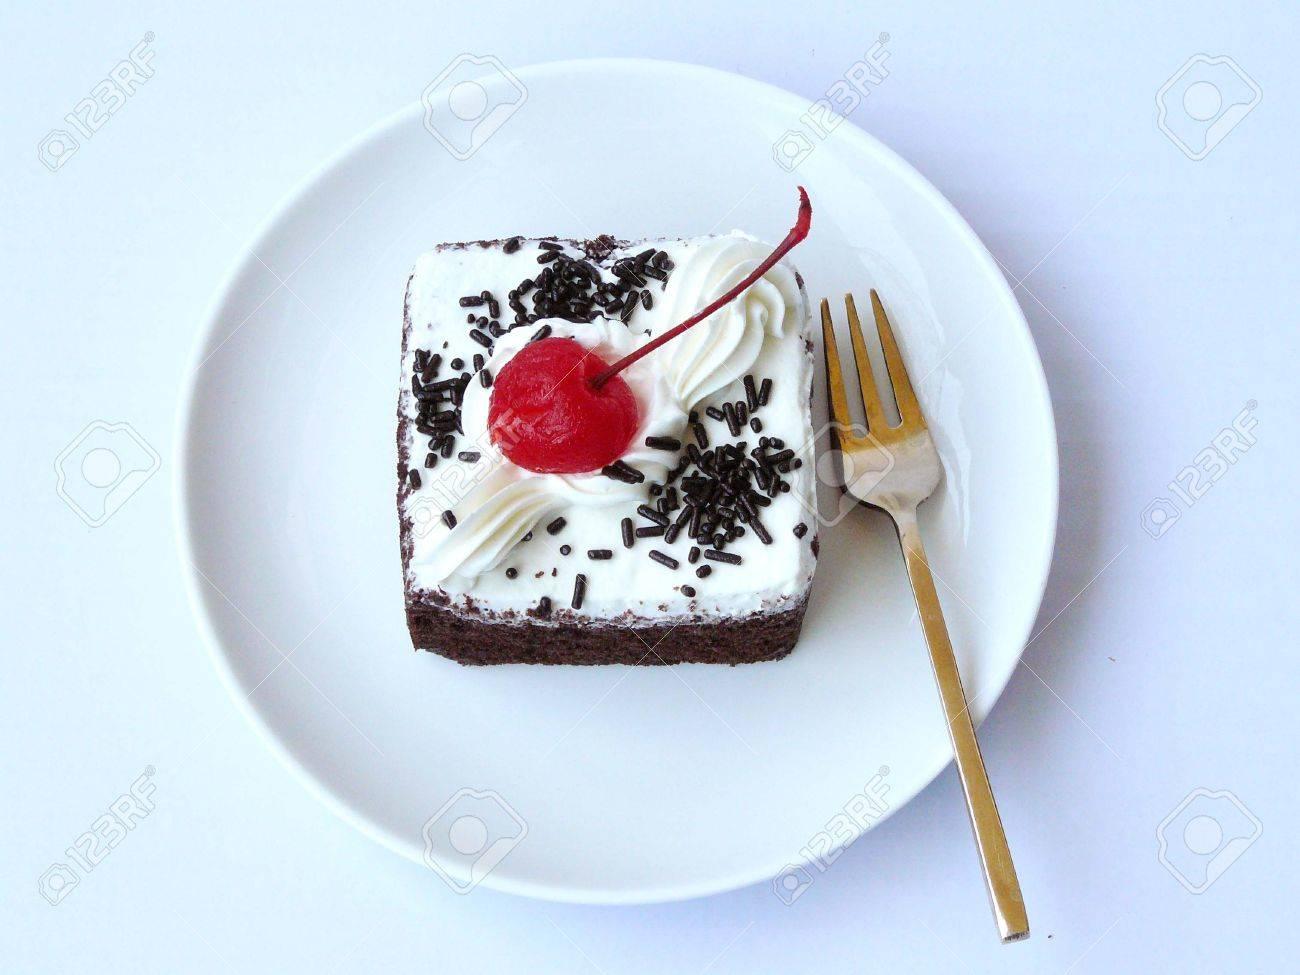 Kostliche Mini Chiffon Schokoladenkuchen Die Schokolade Chiffon